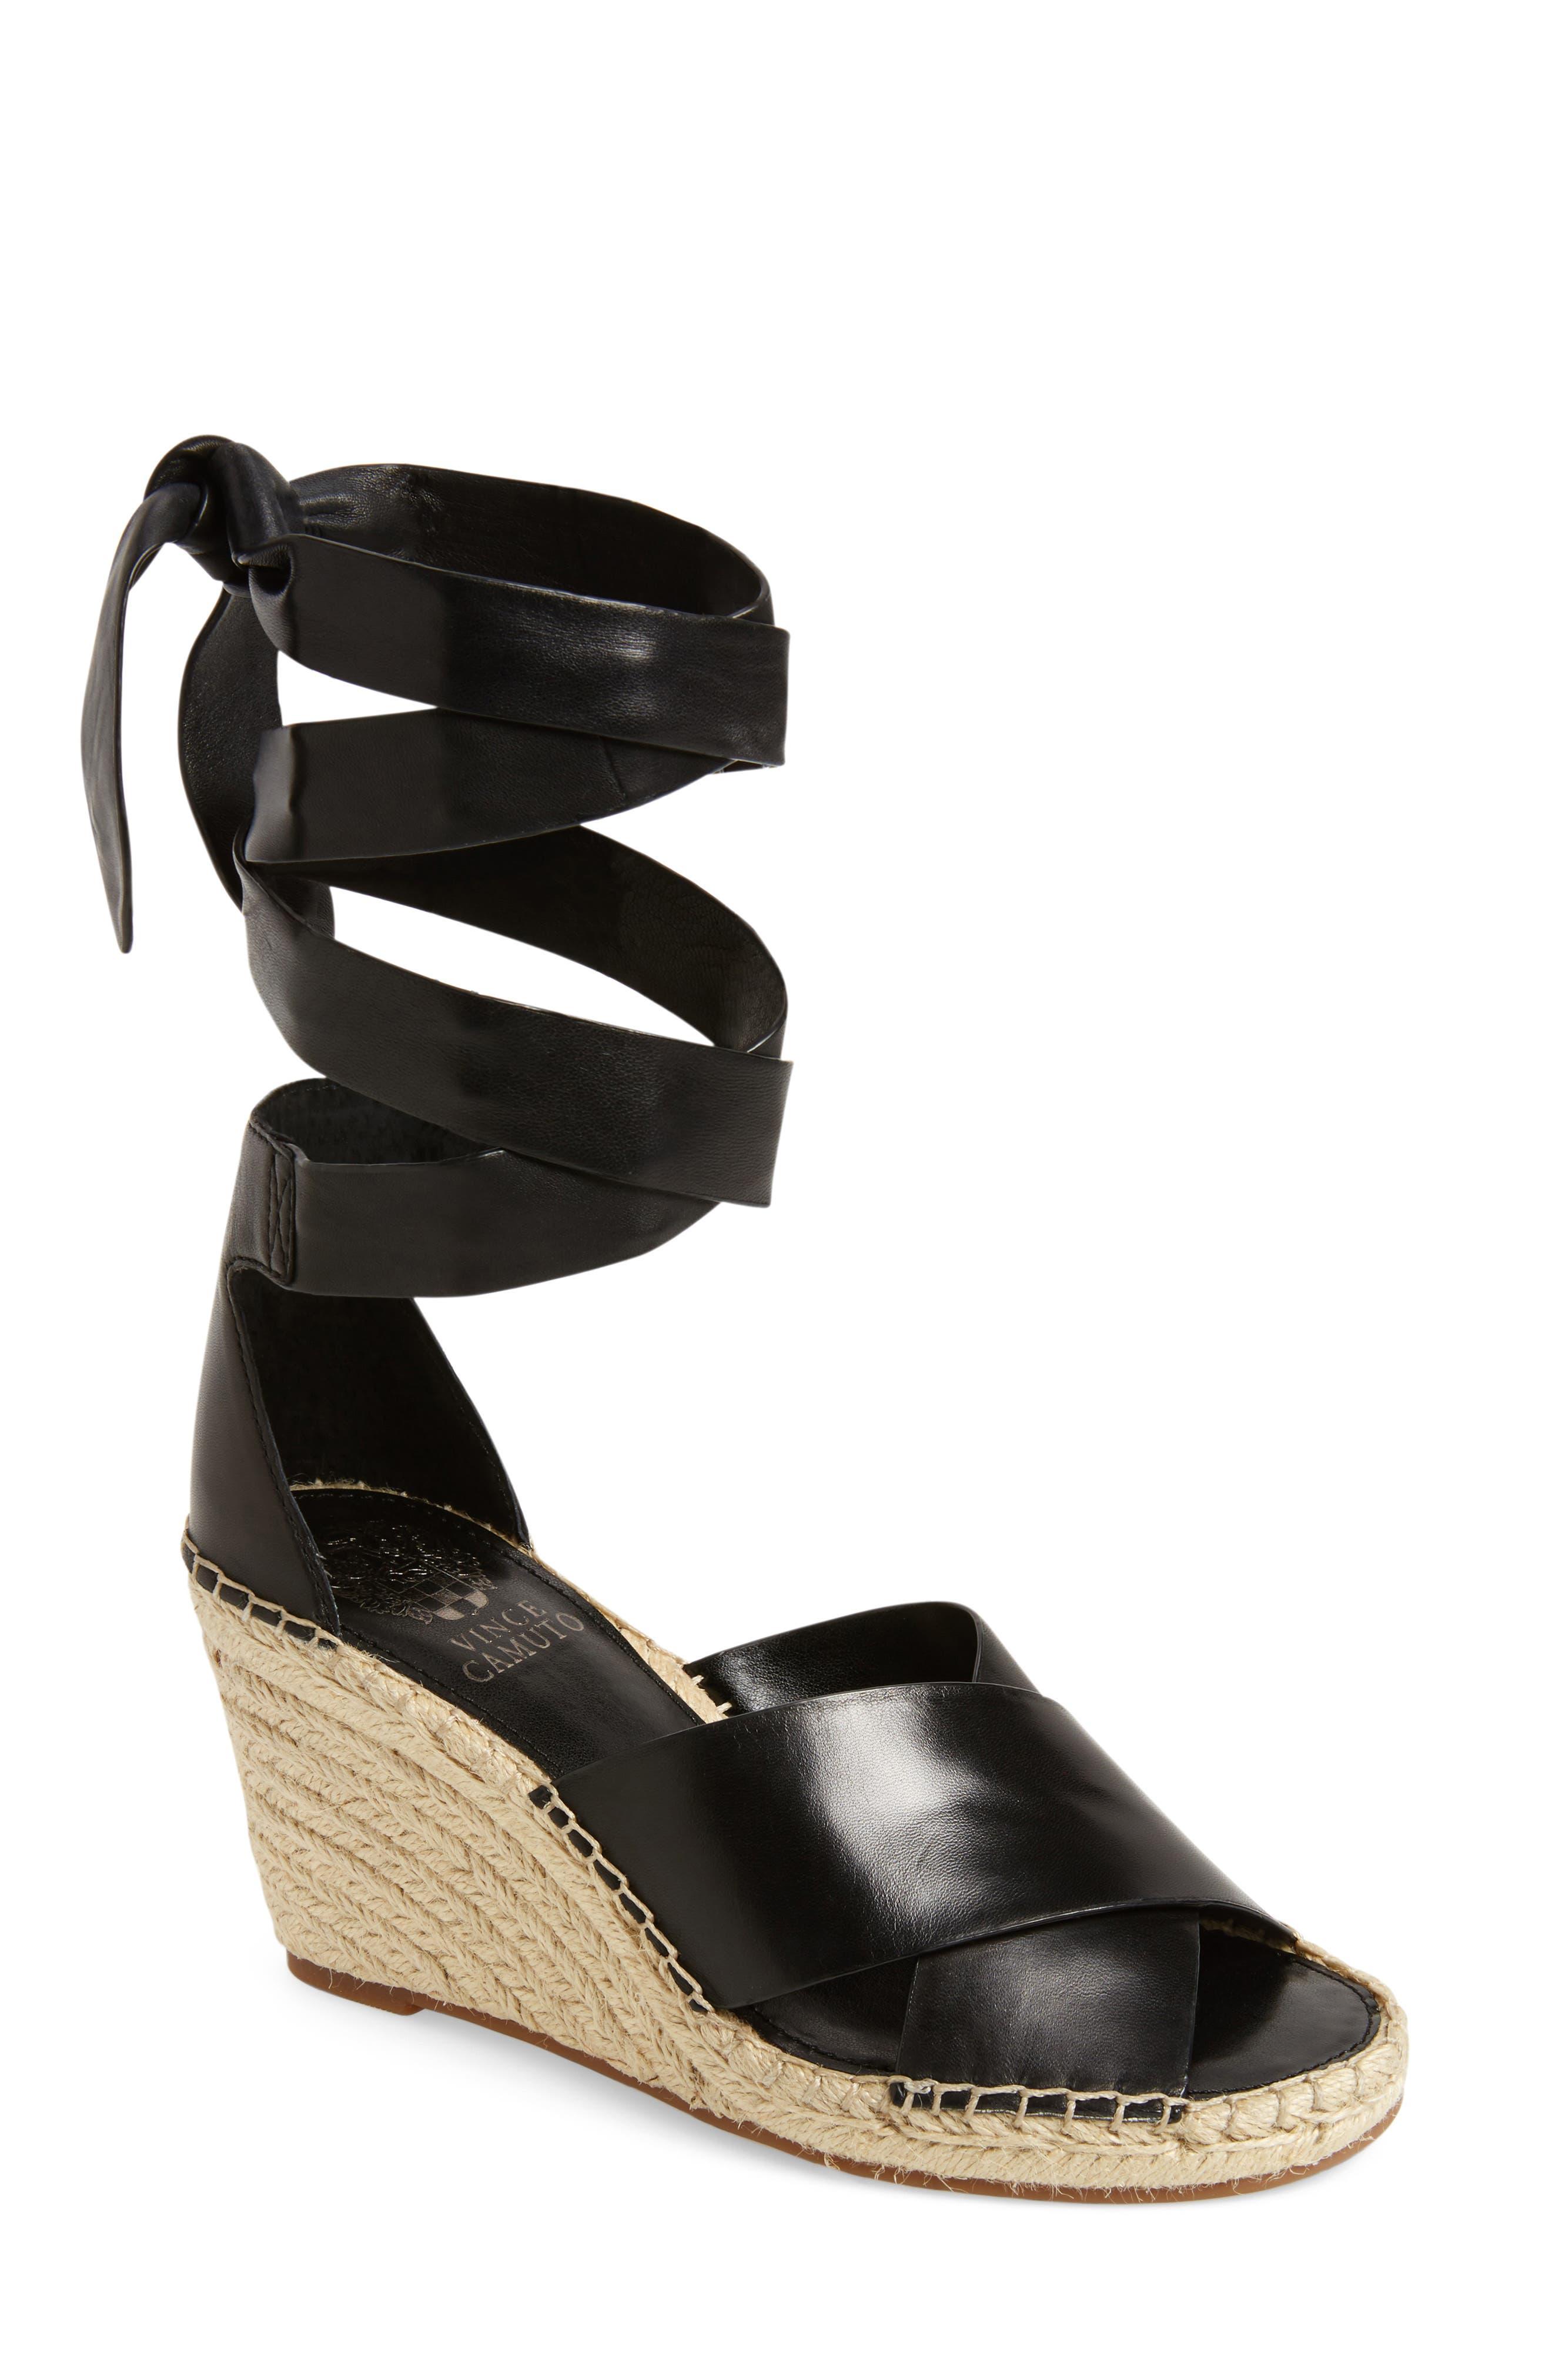 Leddy Wedge Sandal,                         Main,                         color, 001